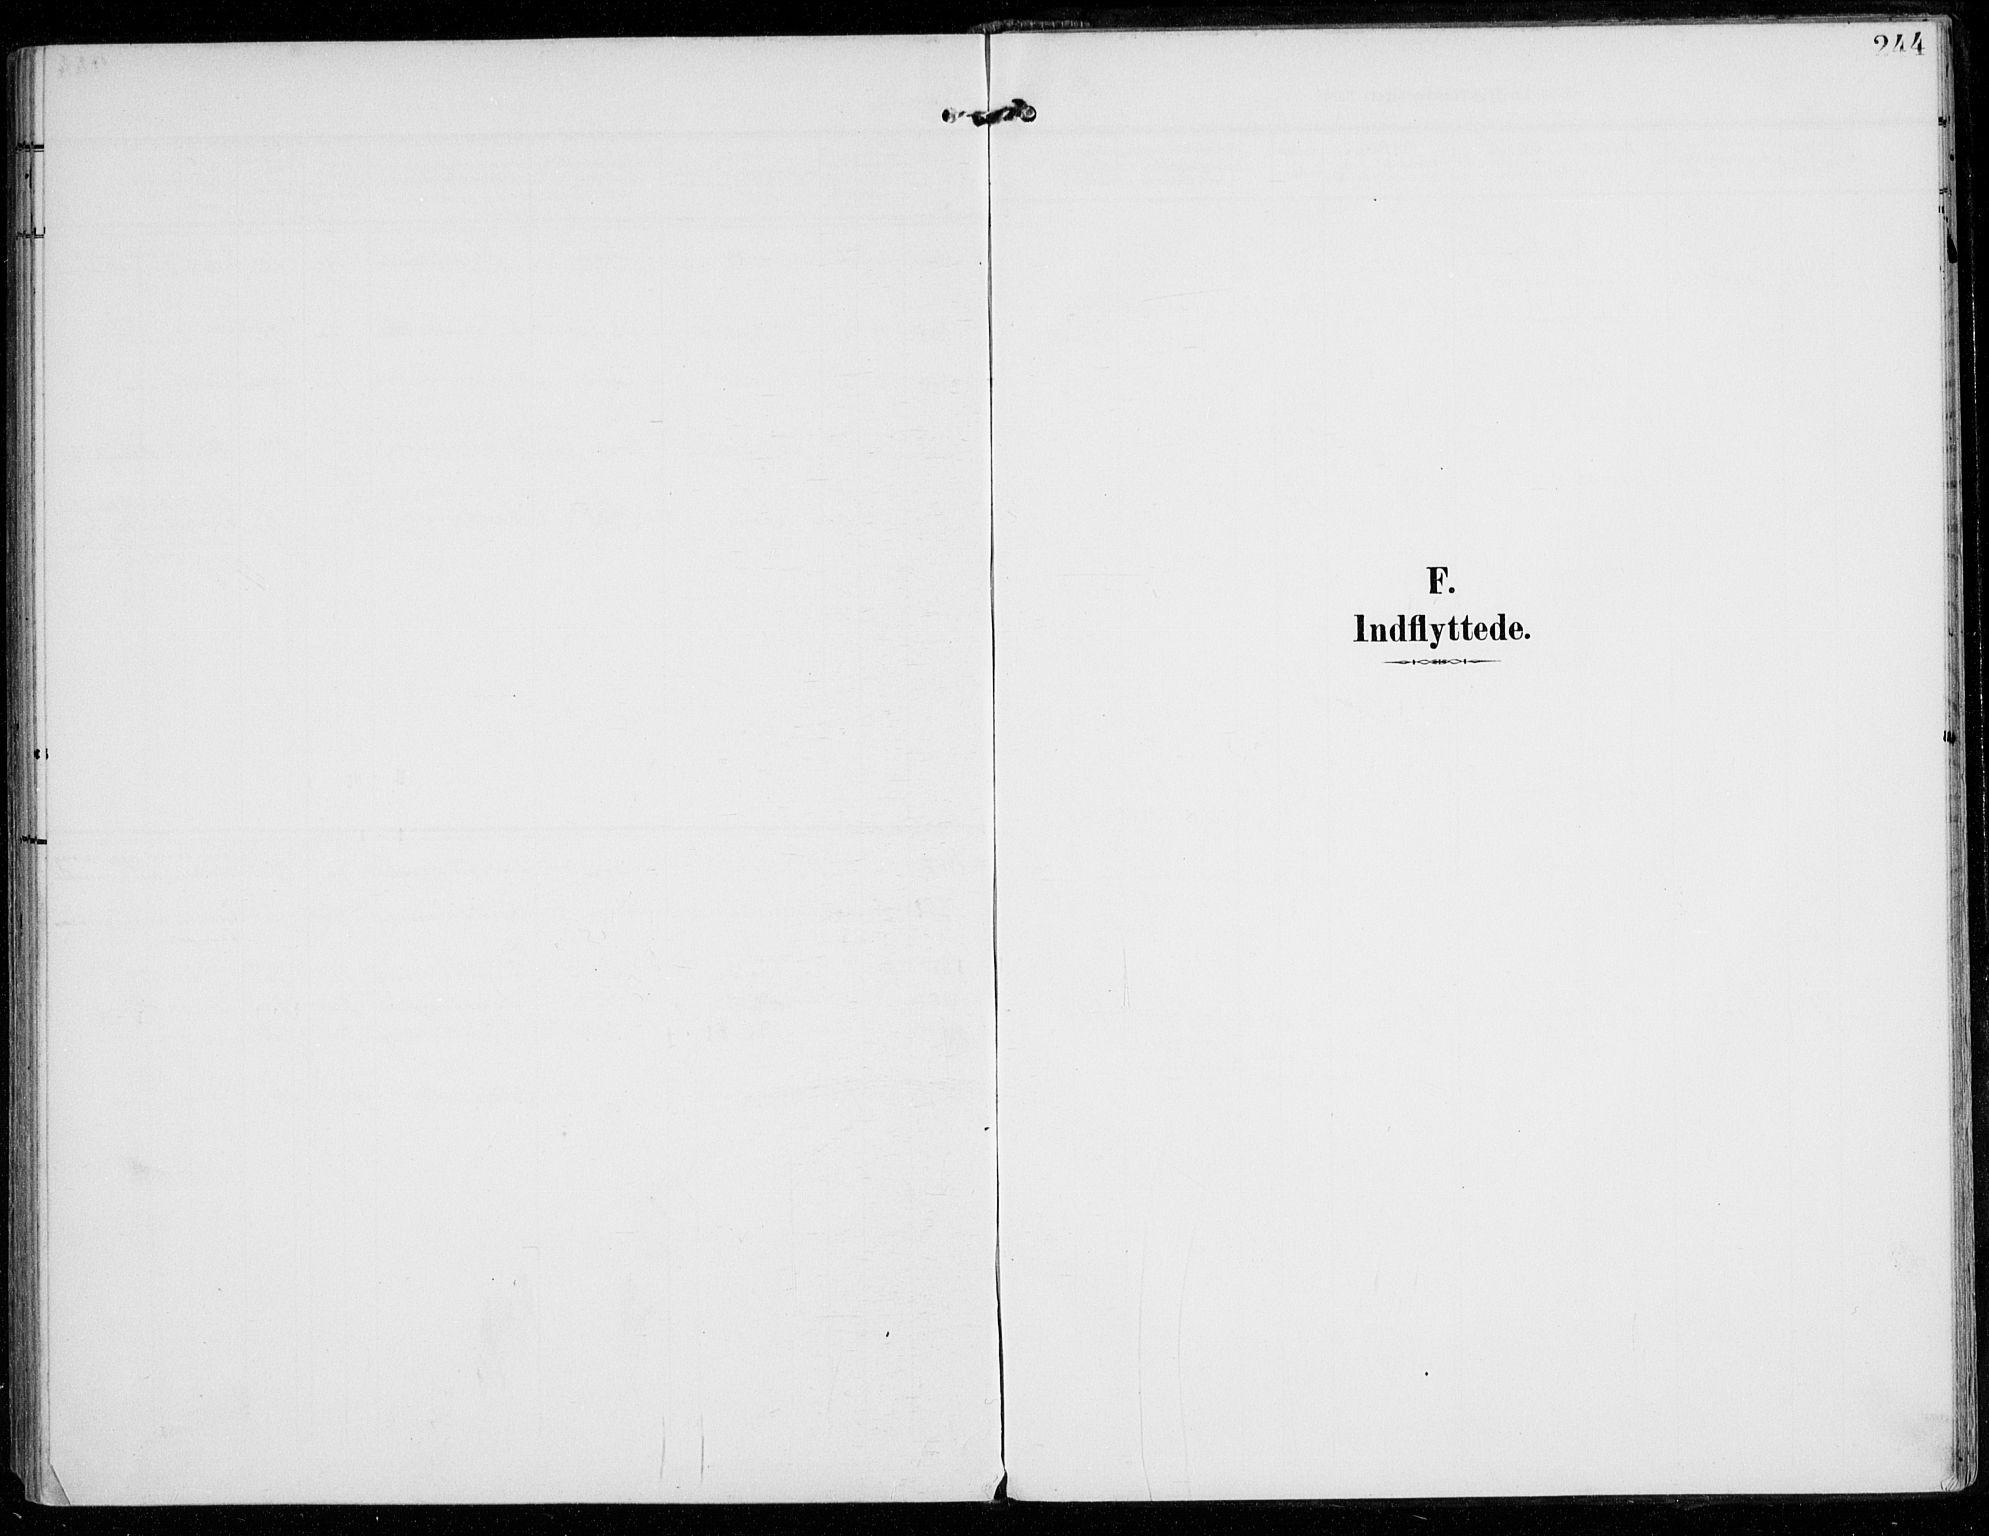 SAO, Vestby prestekontor Kirkebøker, F/Fc/L0002: Ministerialbok nr. III 2, 1906-1940, s. 244